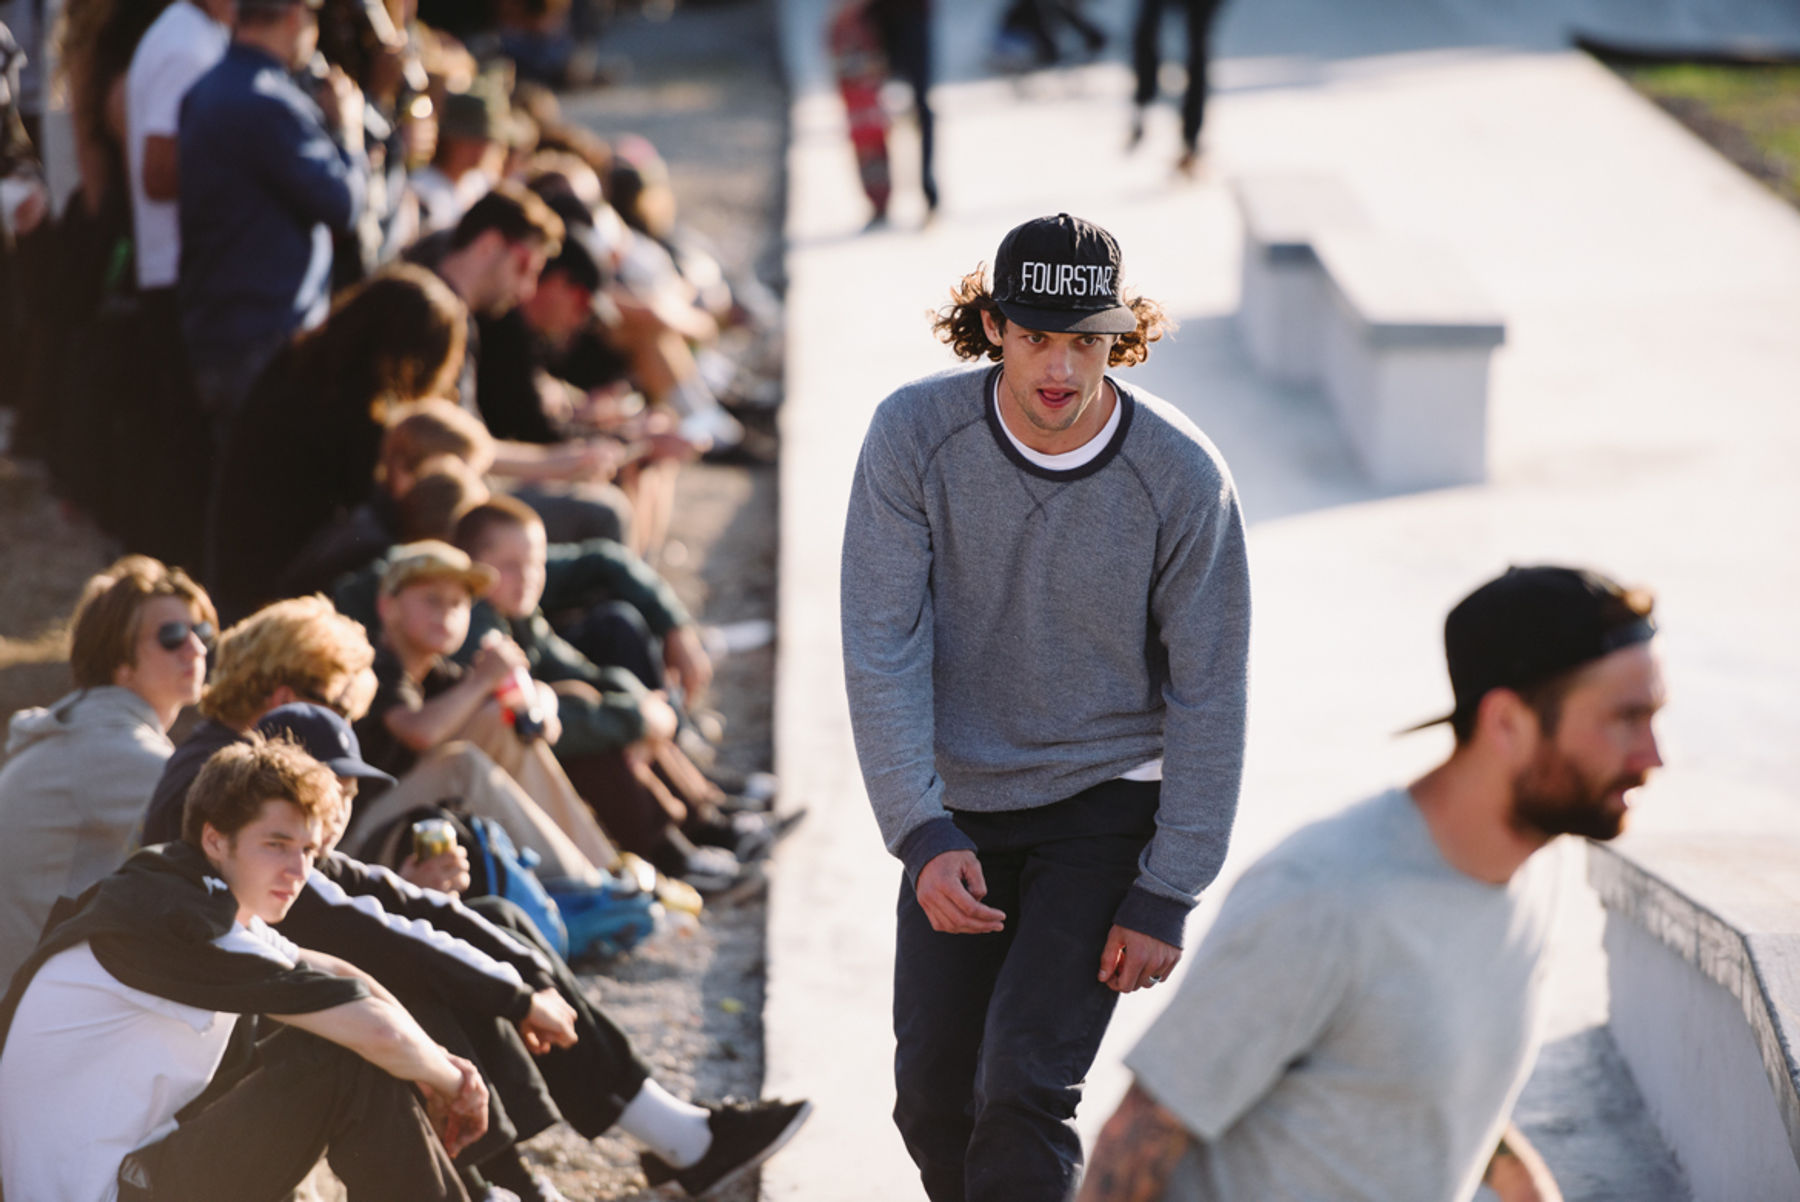 _IHC5952e-Andrew-Brophy-Nike-SB-Copenhagen-Open-Day-4-July-2015-Photographer-Maksim-Kalanep